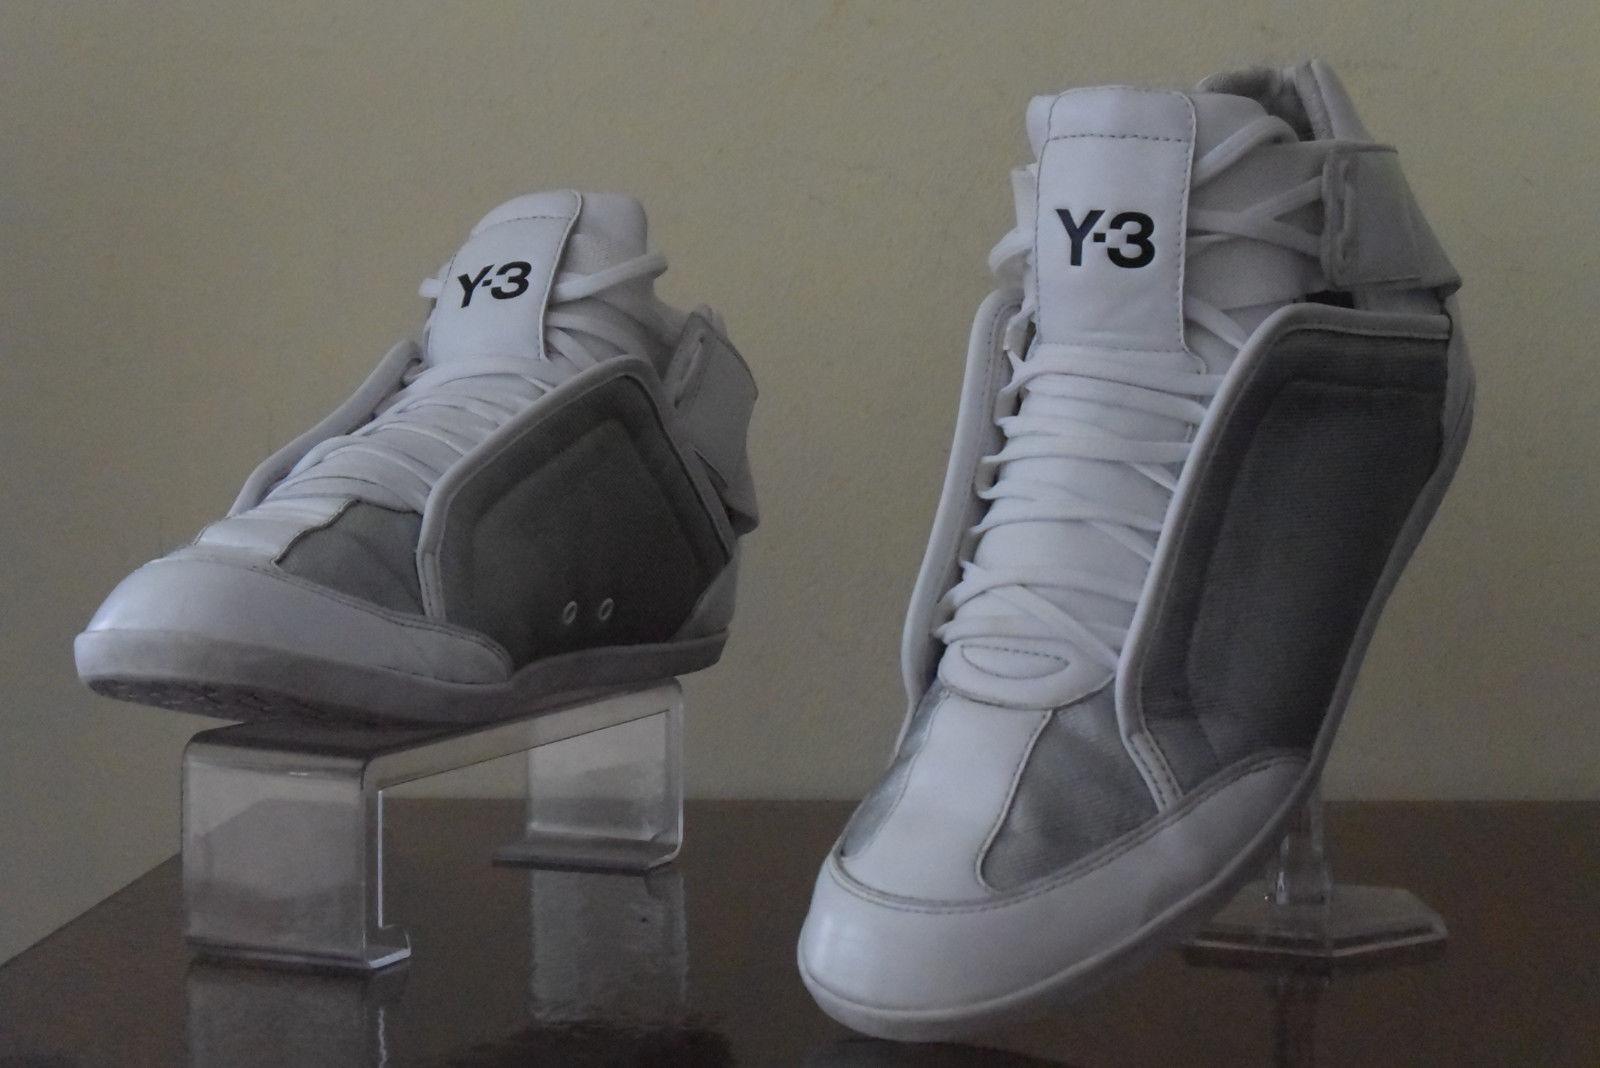 Adidas Y-3 Kazuhiri Yohji Yamamoto Sneakers Sz 11